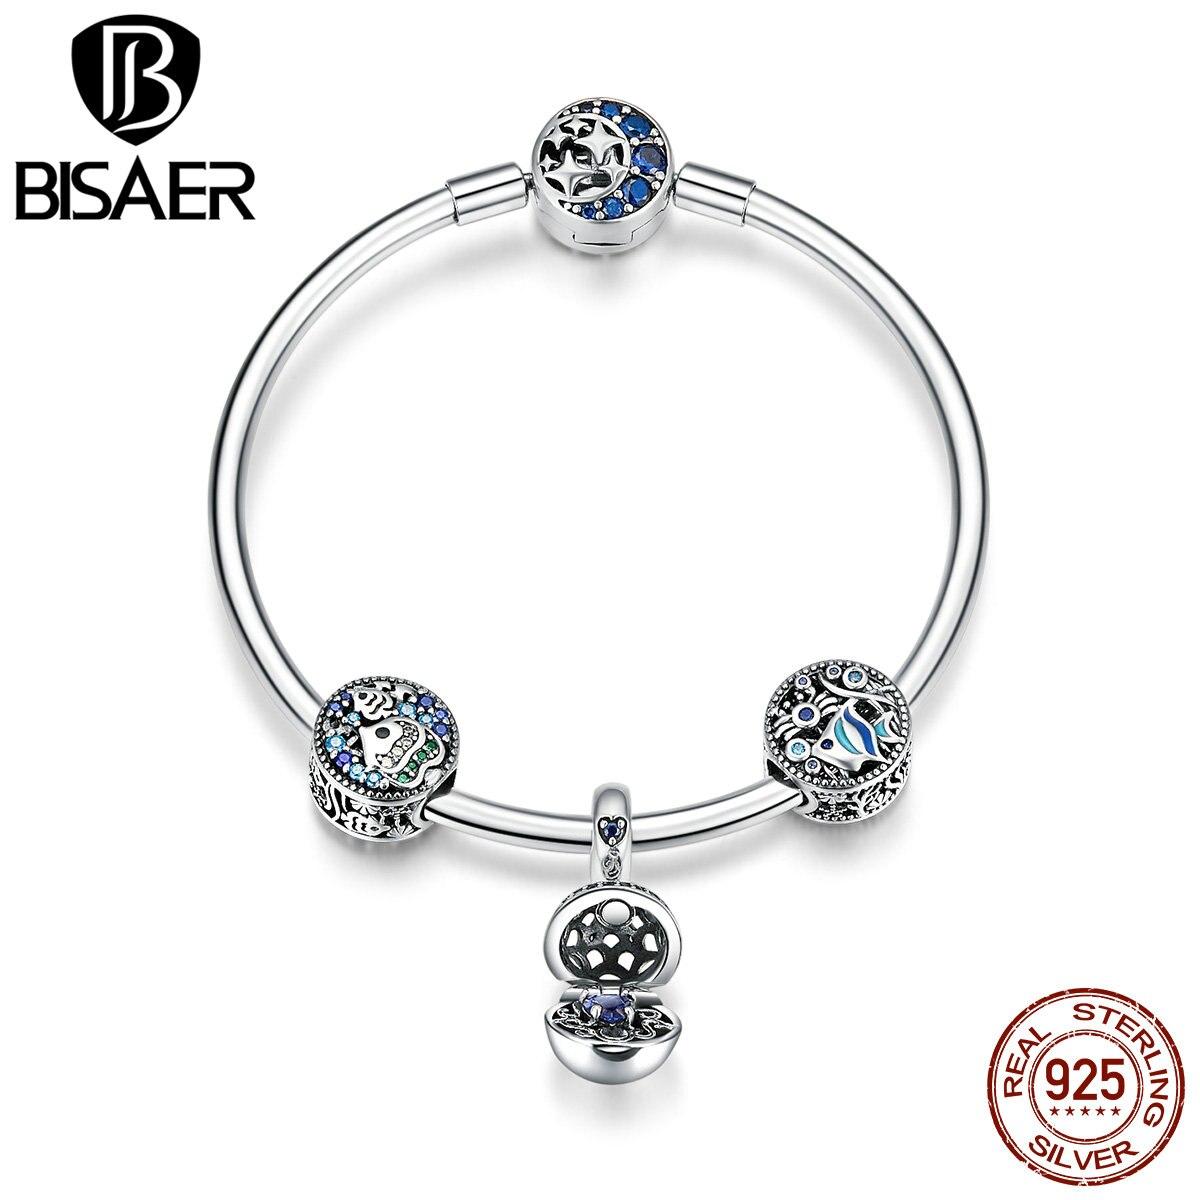 BISAER 925 Sterling Silver Blue Ocean Tropical Fish Moon Star Women Bracelets Femme Bangles Sterling Silver